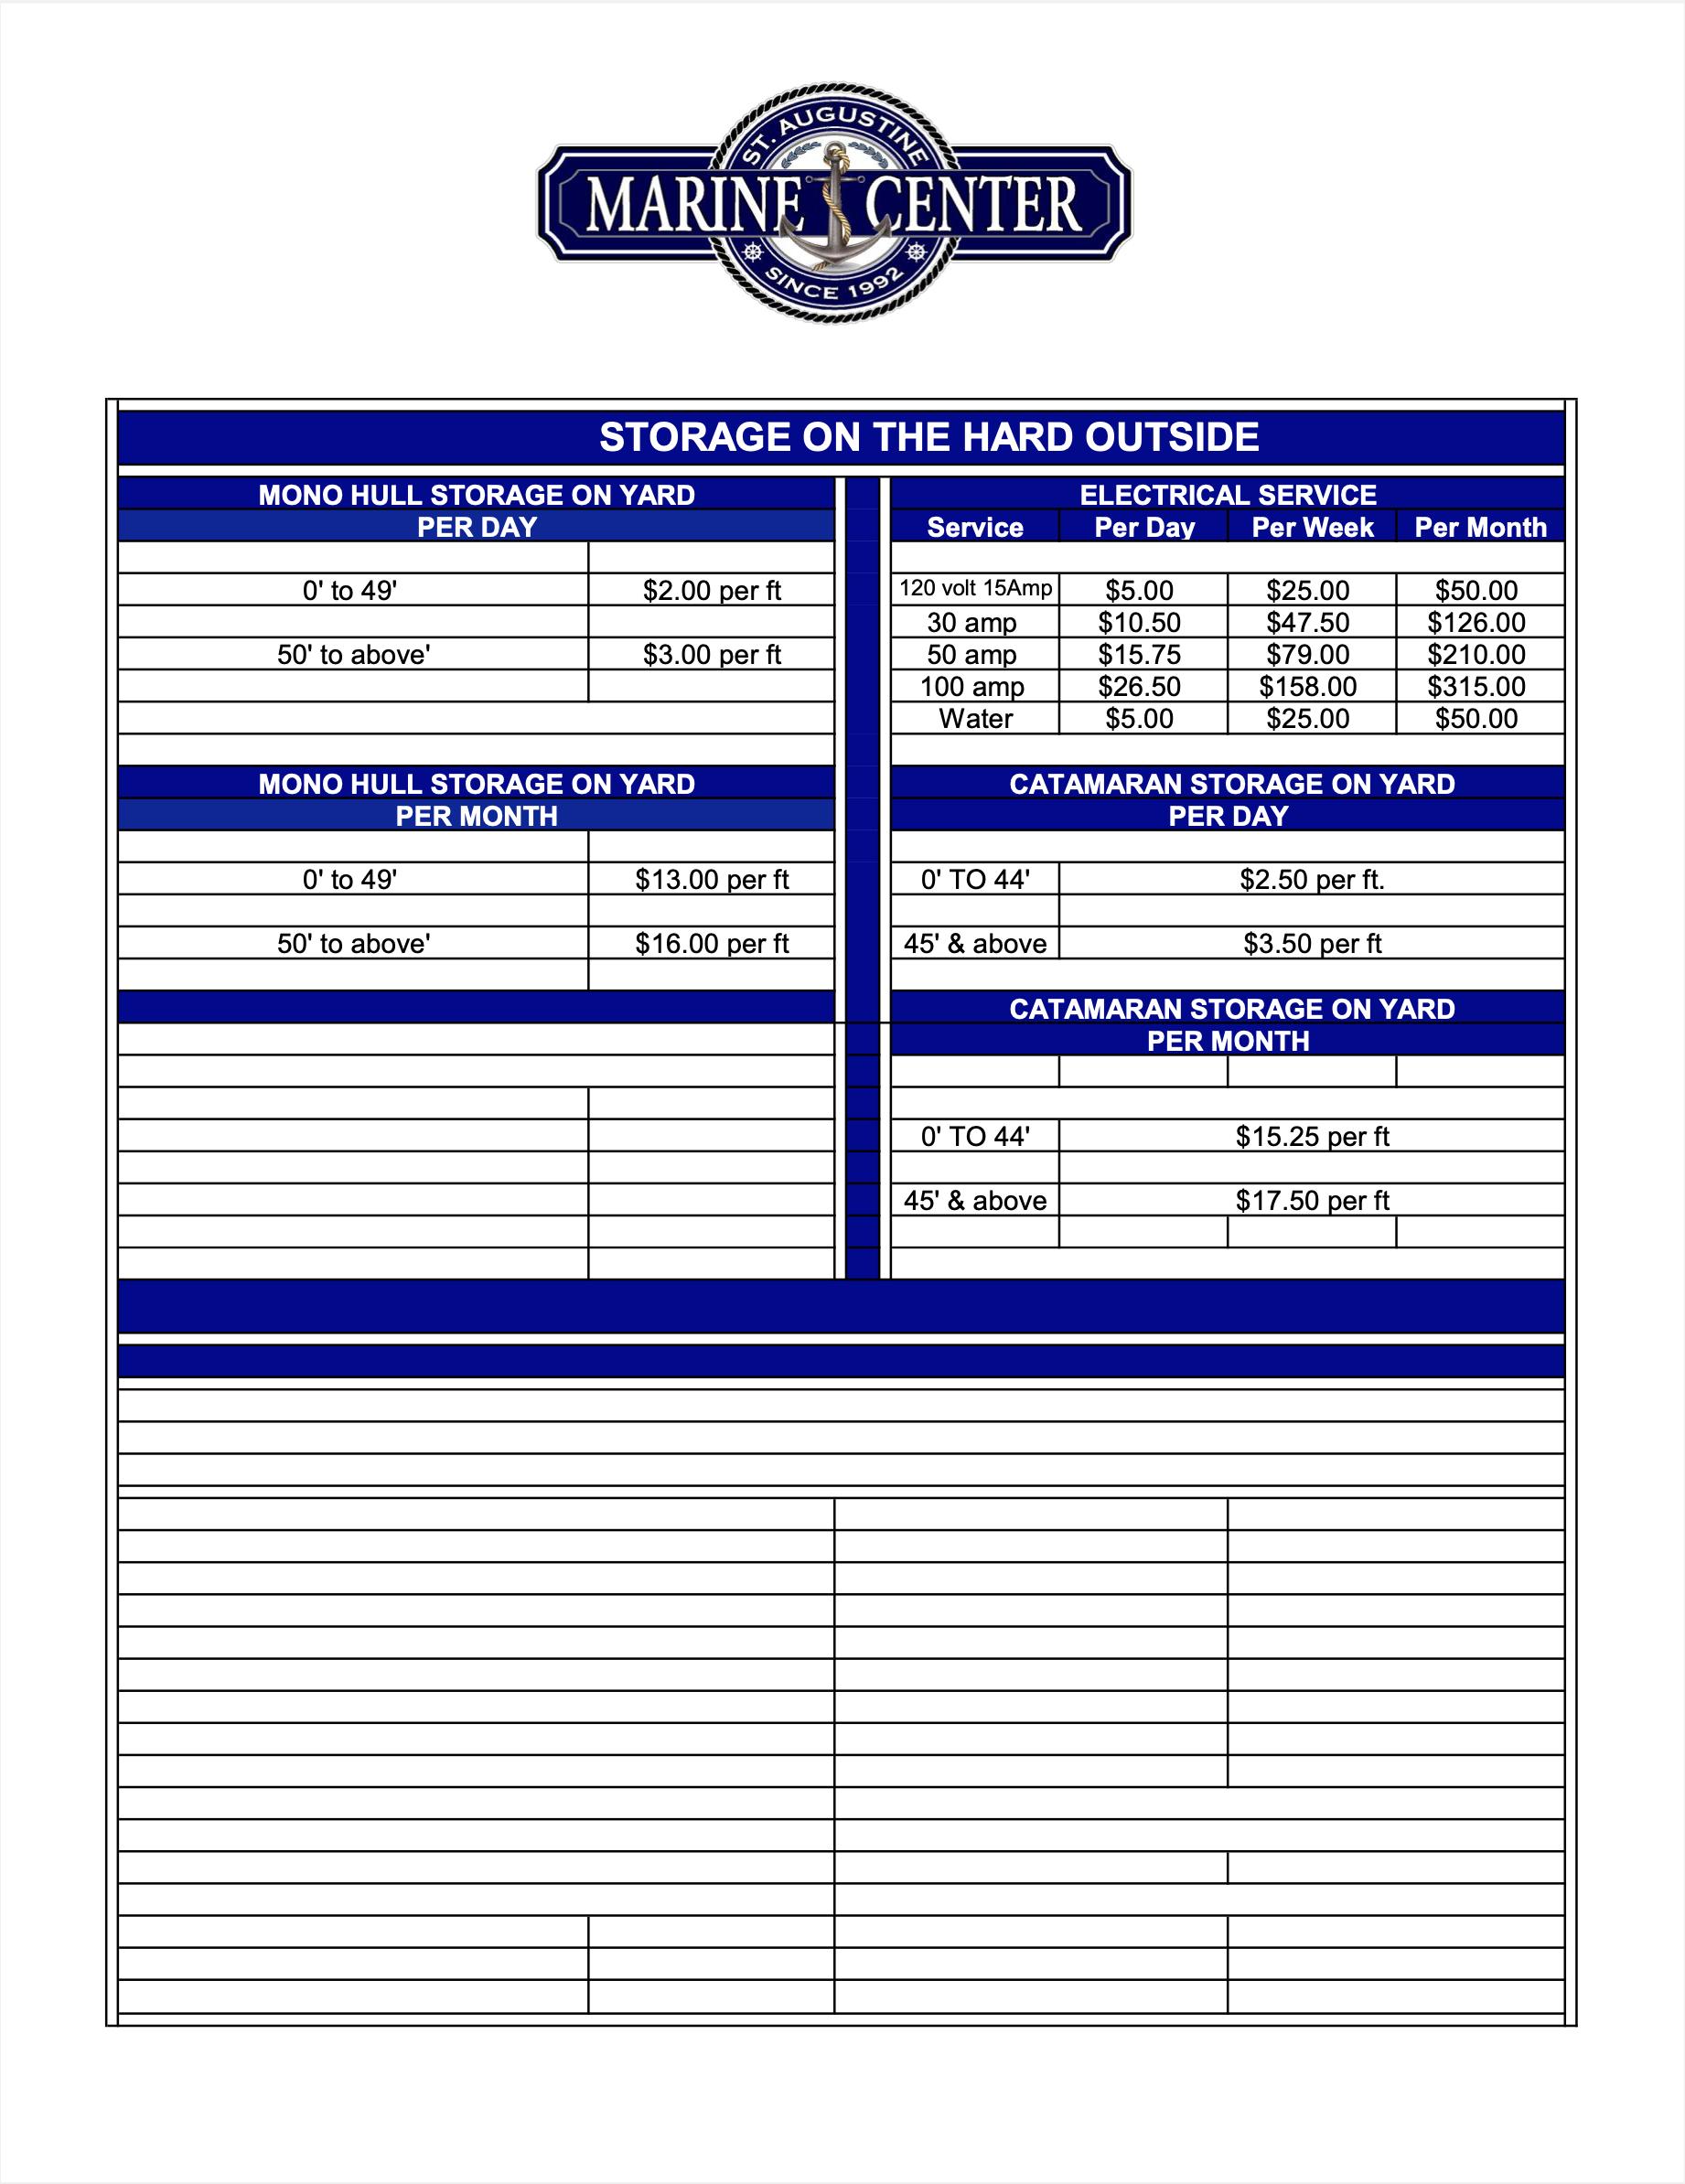 St Augustine Marine Center Rates 10-21 p3